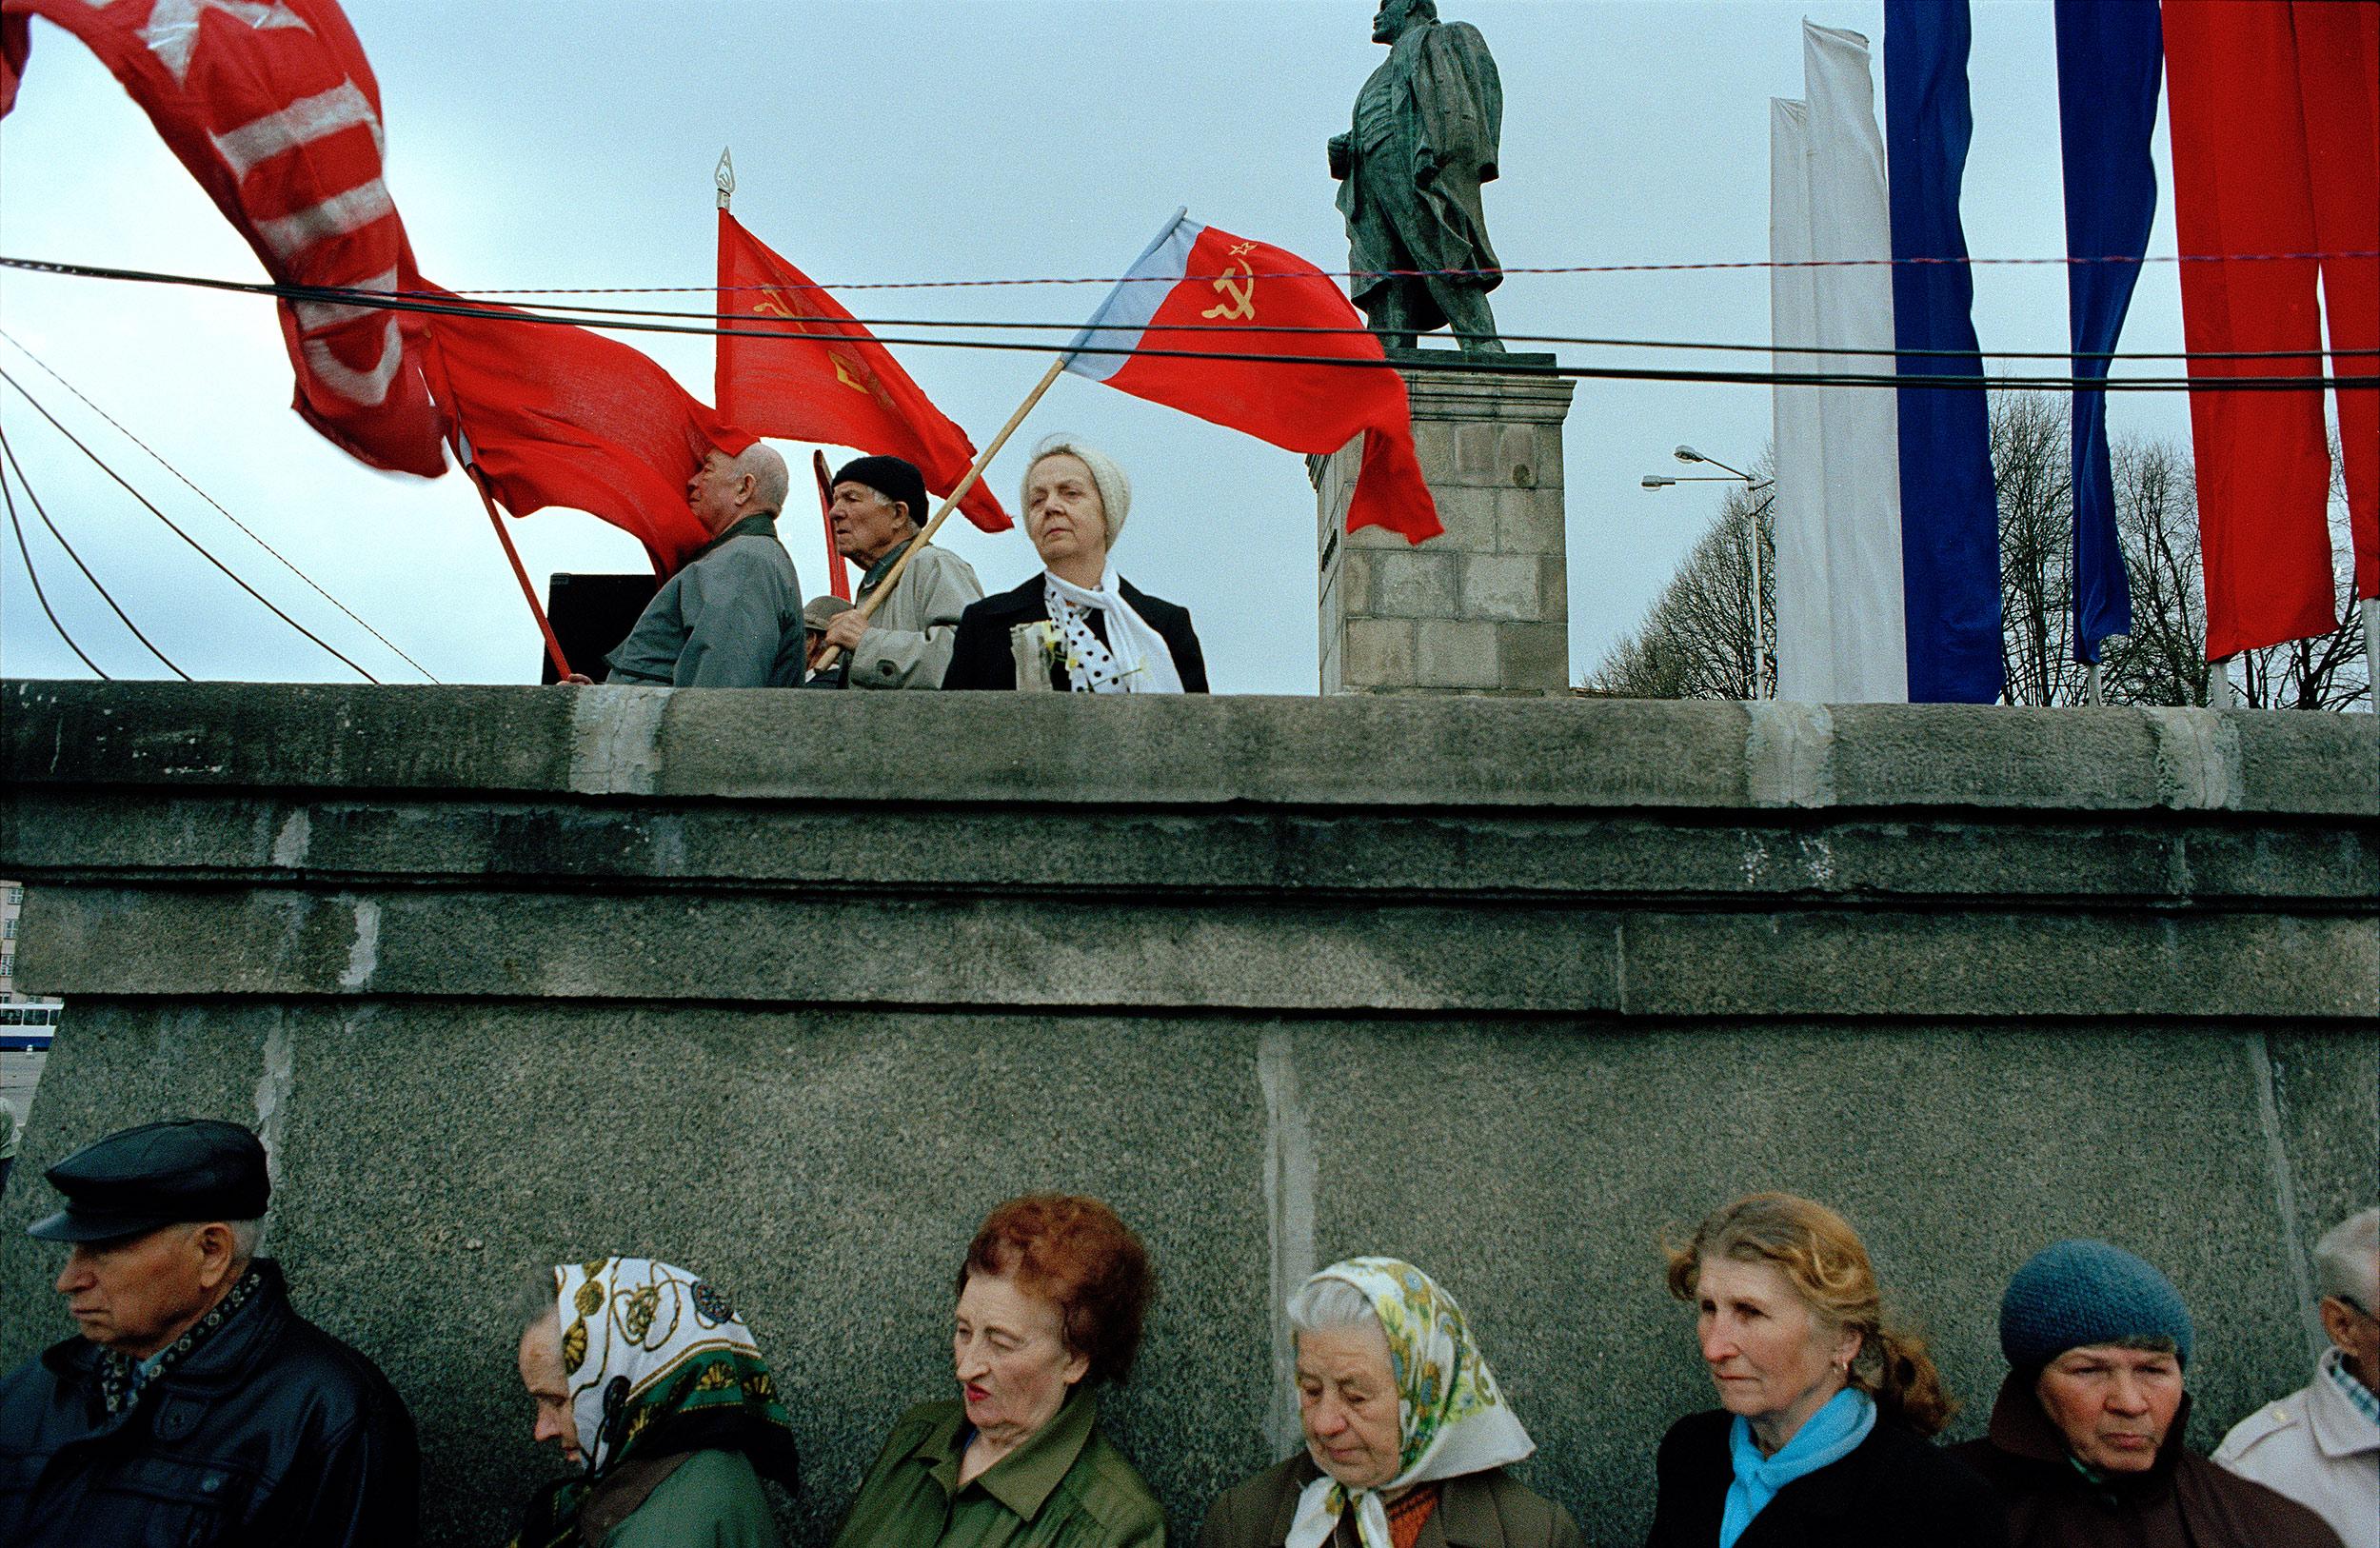 Kaliningrad, May 1, 2003